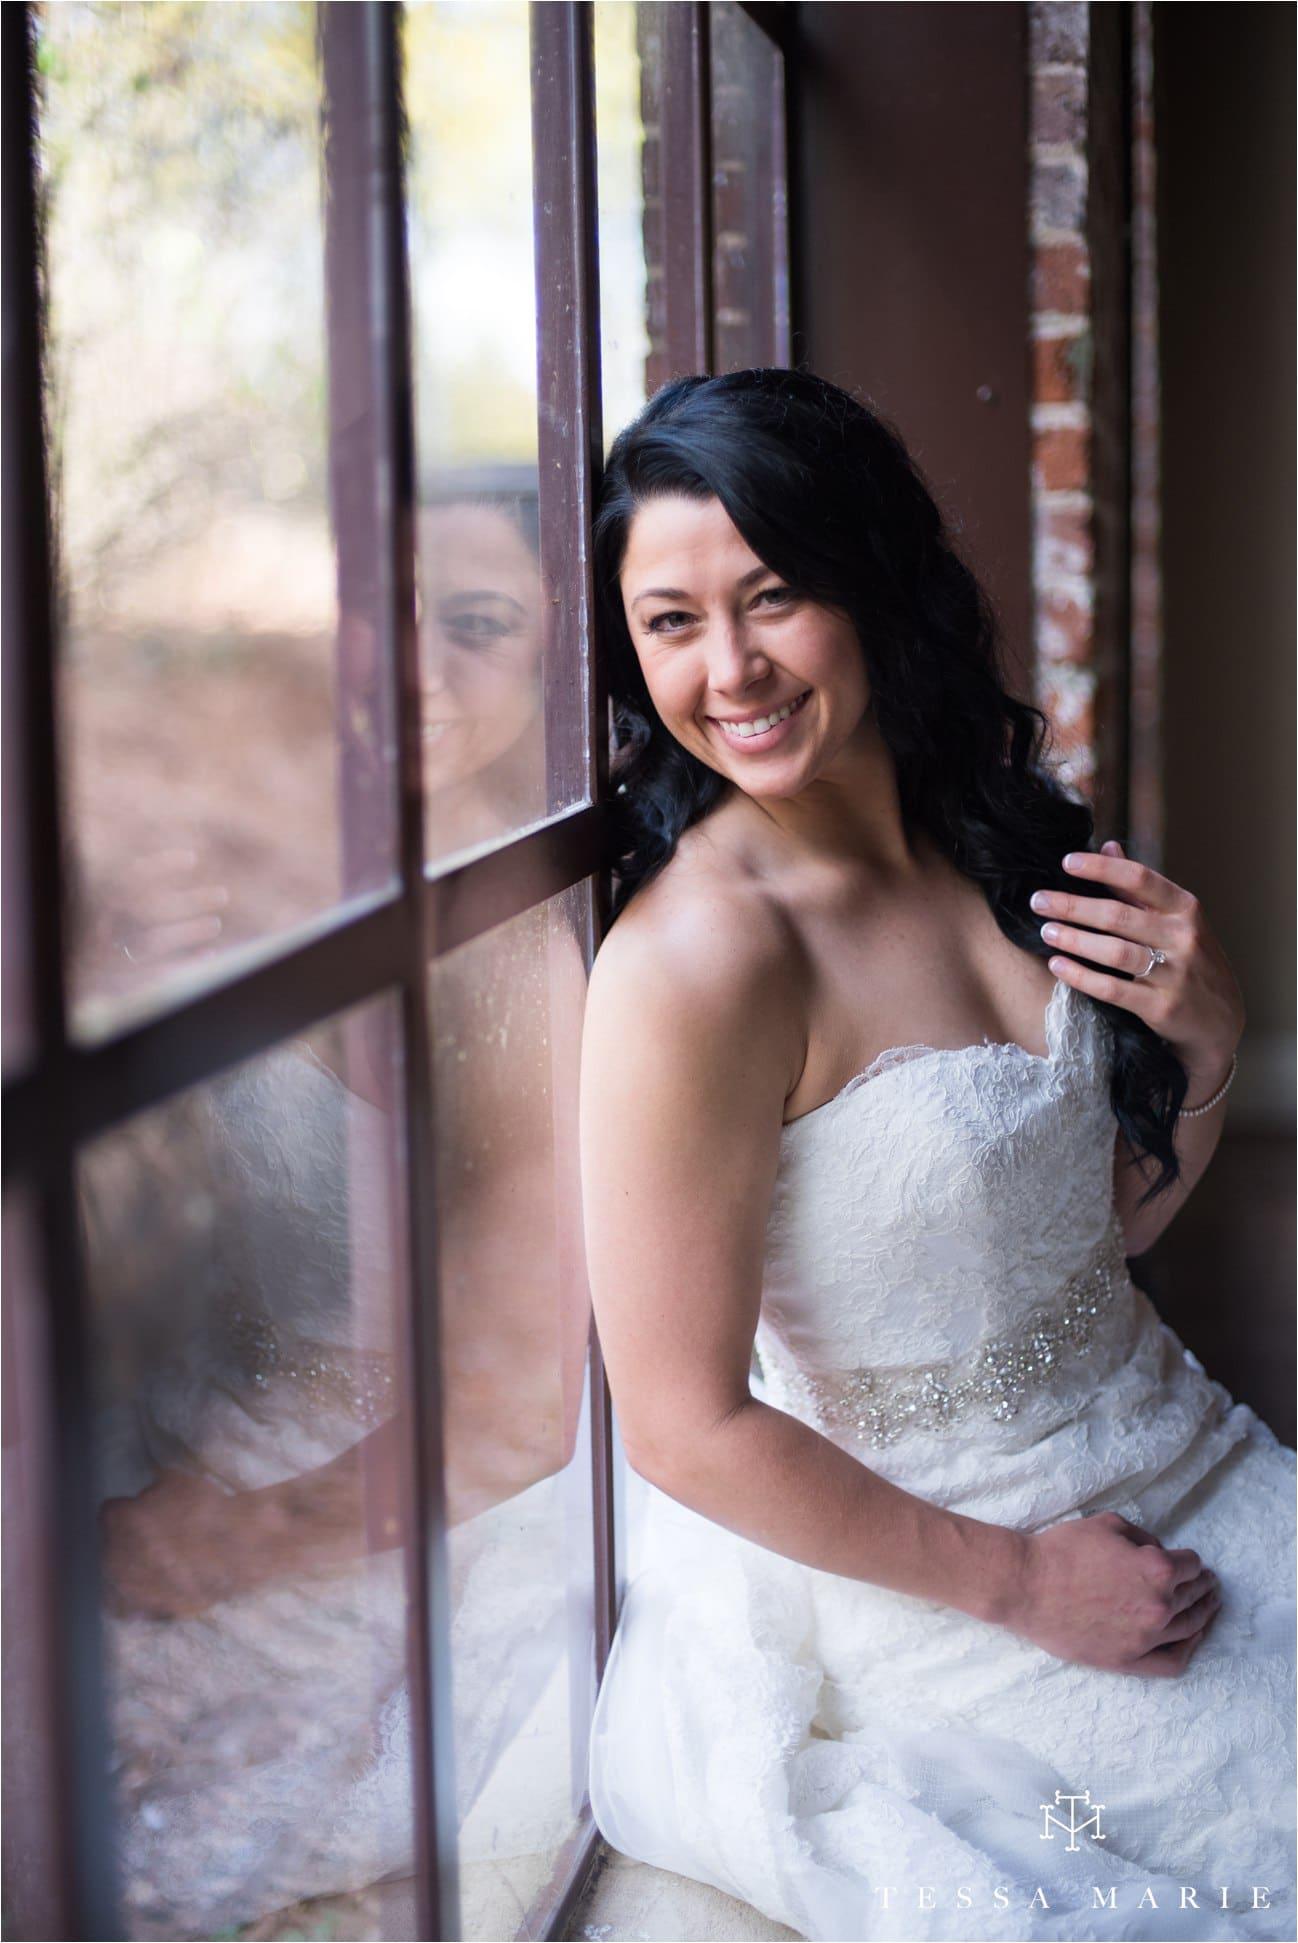 tessa_marie_weddings_rivermill_event_centere_candid_outdoor_wedding_photos_0042